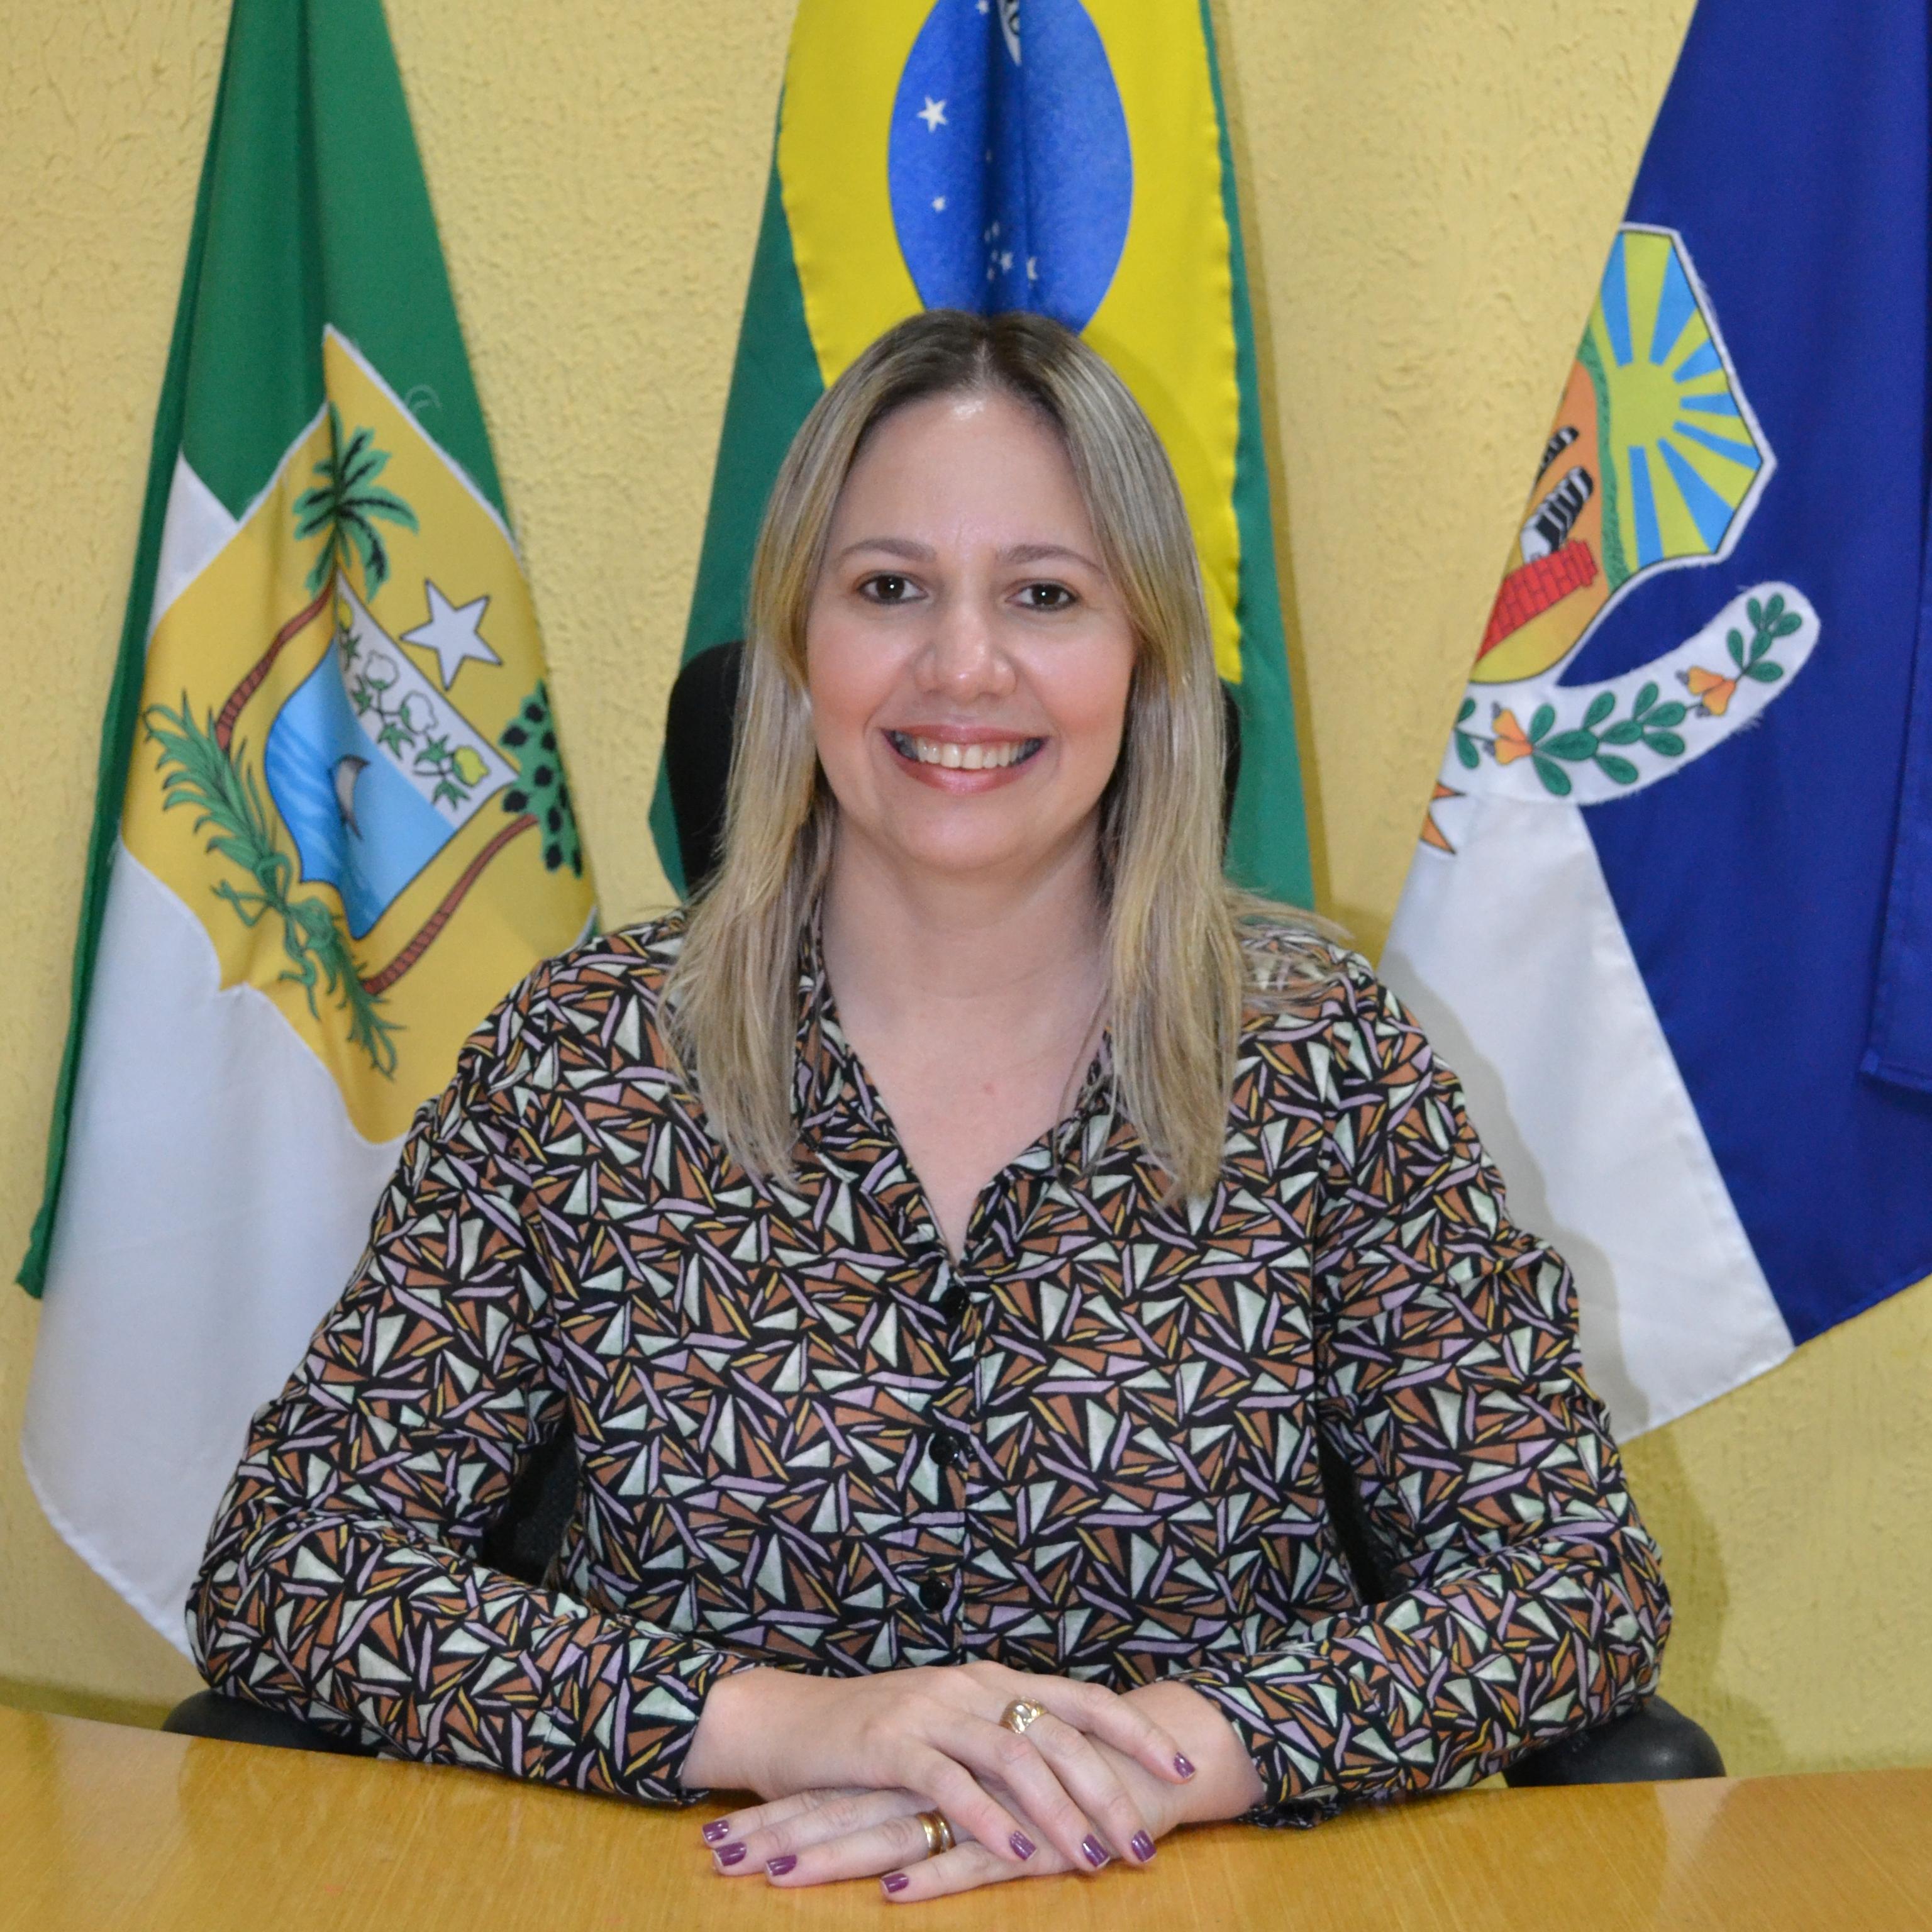 Maria Izaura Leite Veras